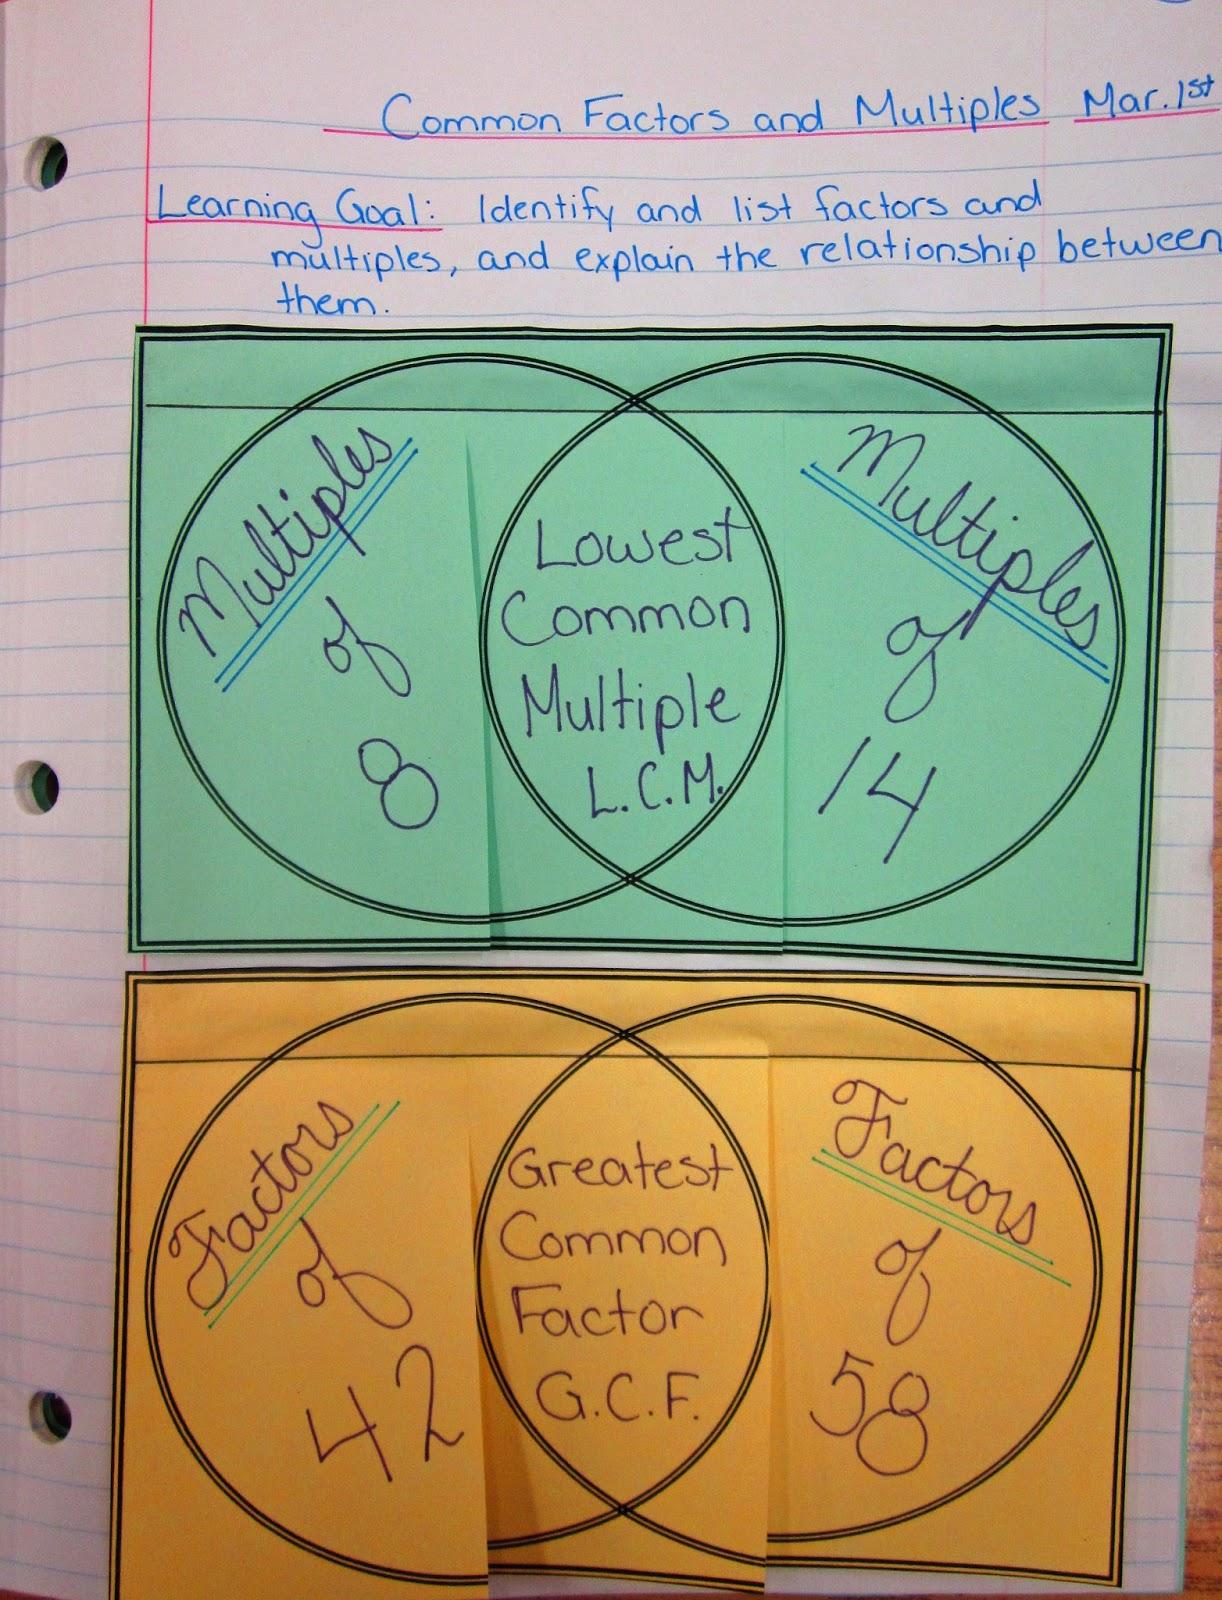 Venn Diagram Bulletin Board Cilia Nose Runde 39s Room Math Journal Sundays Factors And Multiples